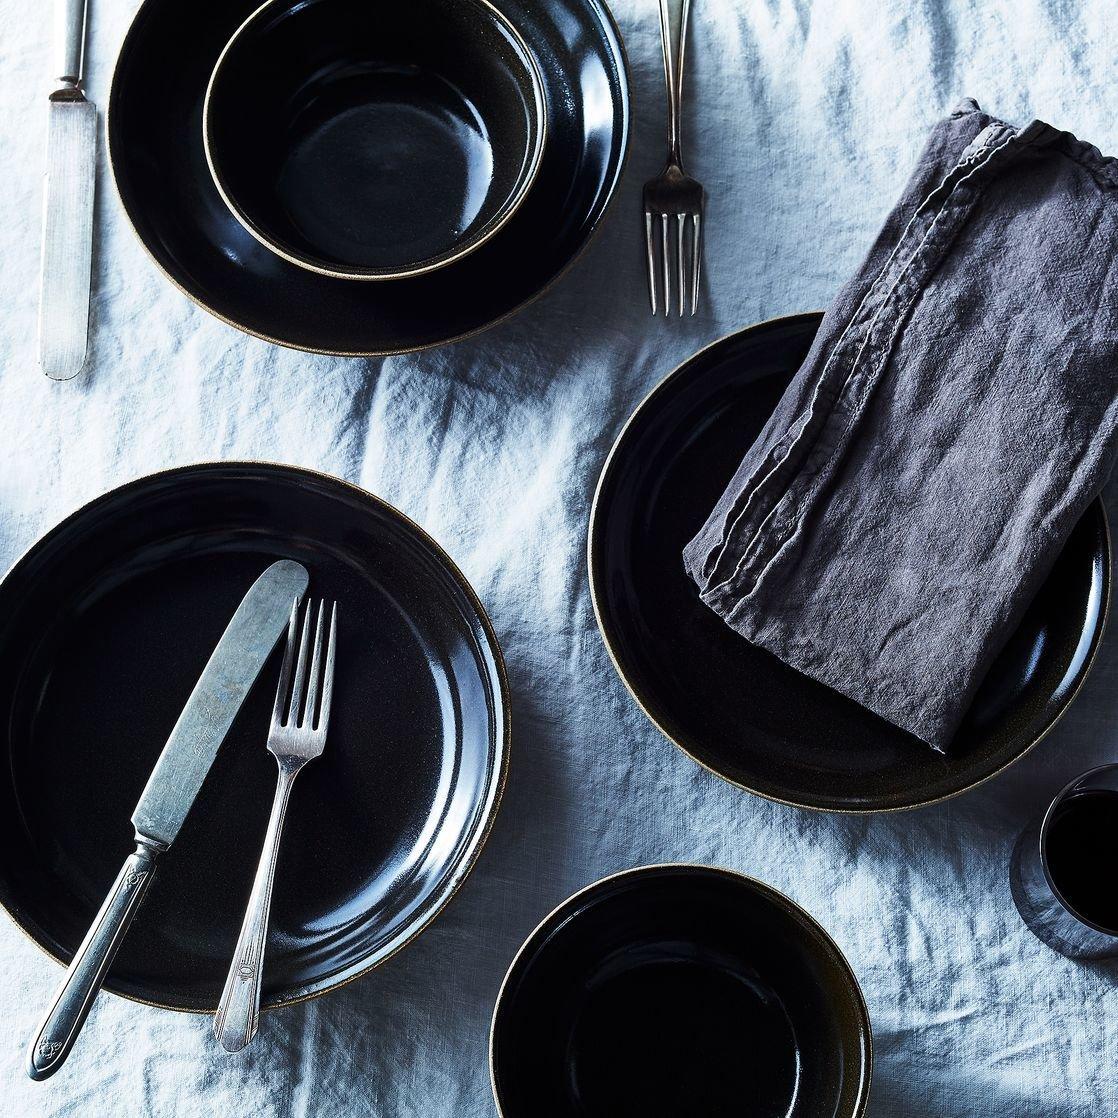 Black Japanese Ceramic Dinnerware (Set of 4) & Black Japanese Ceramic Dinnerware (Set of 4) by Food52 - Dwell